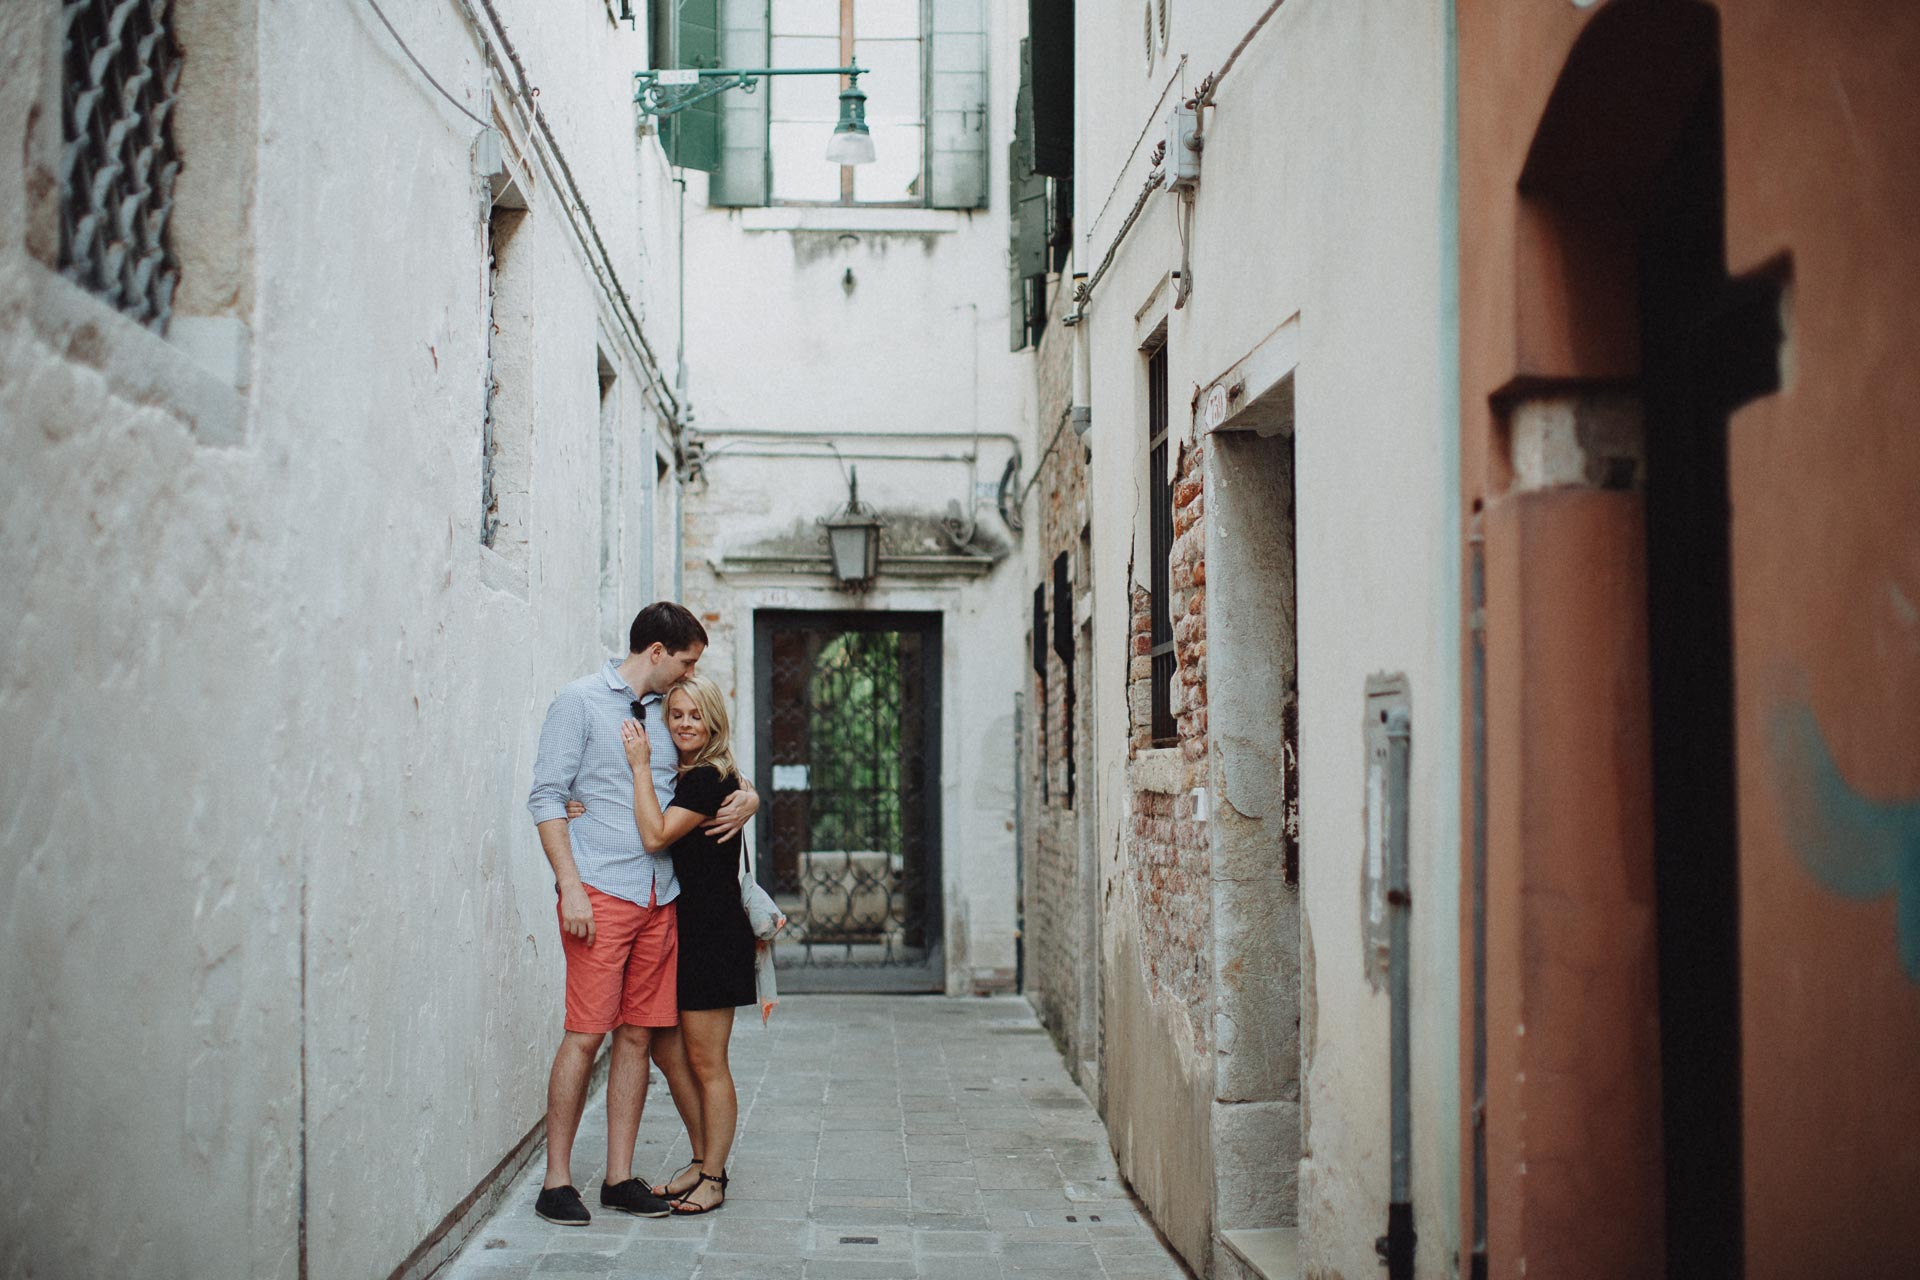 Kristy-Seth-Italy-Elopement-016@2x.jpg